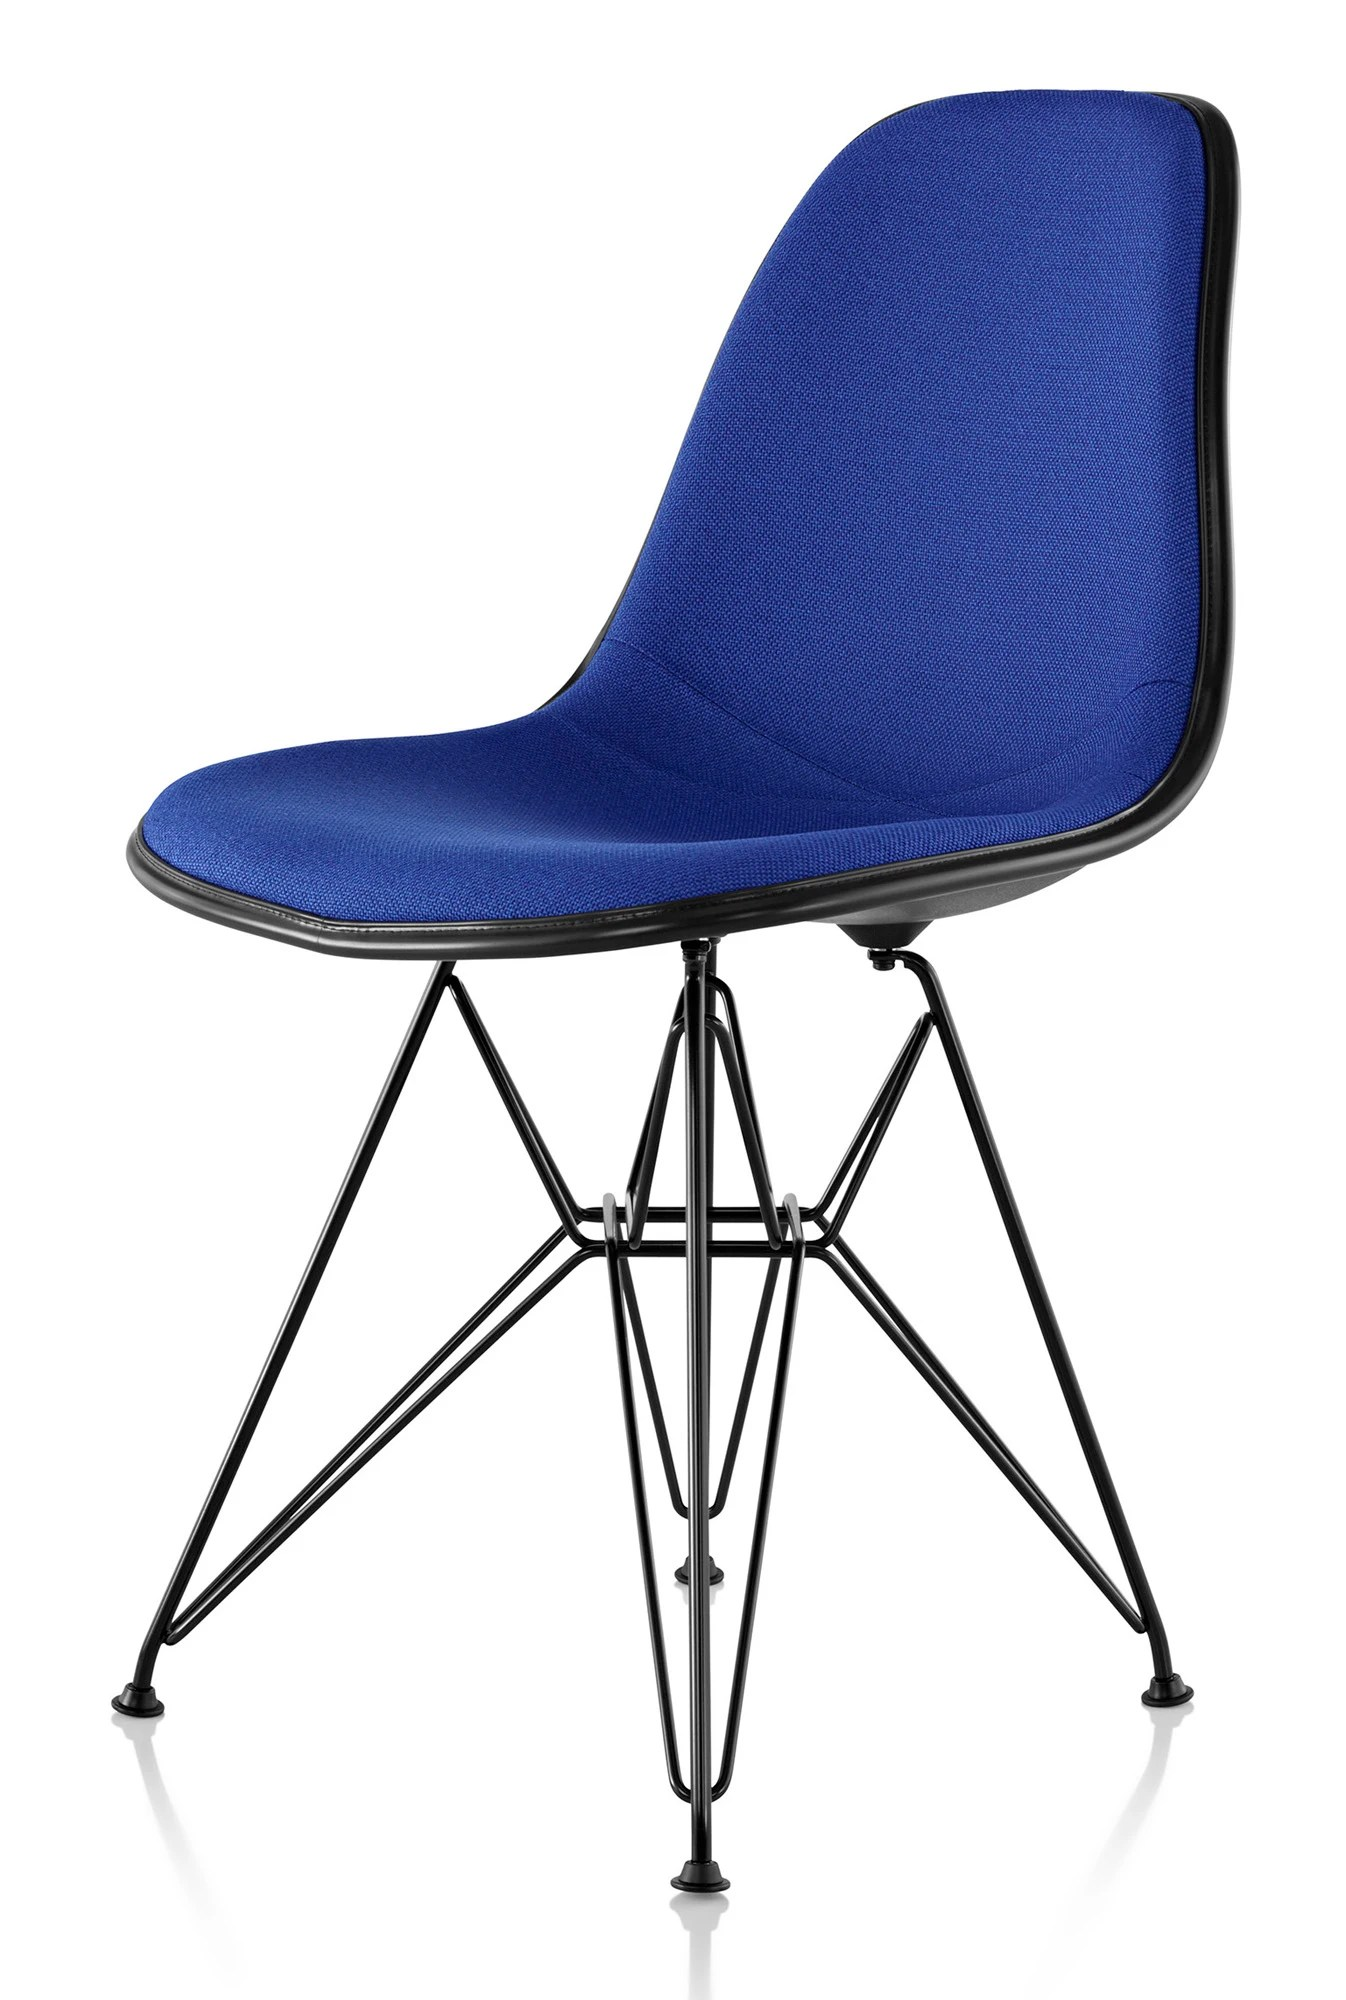 fiberglass shell chair jazzy power weight herman miller eames molded side